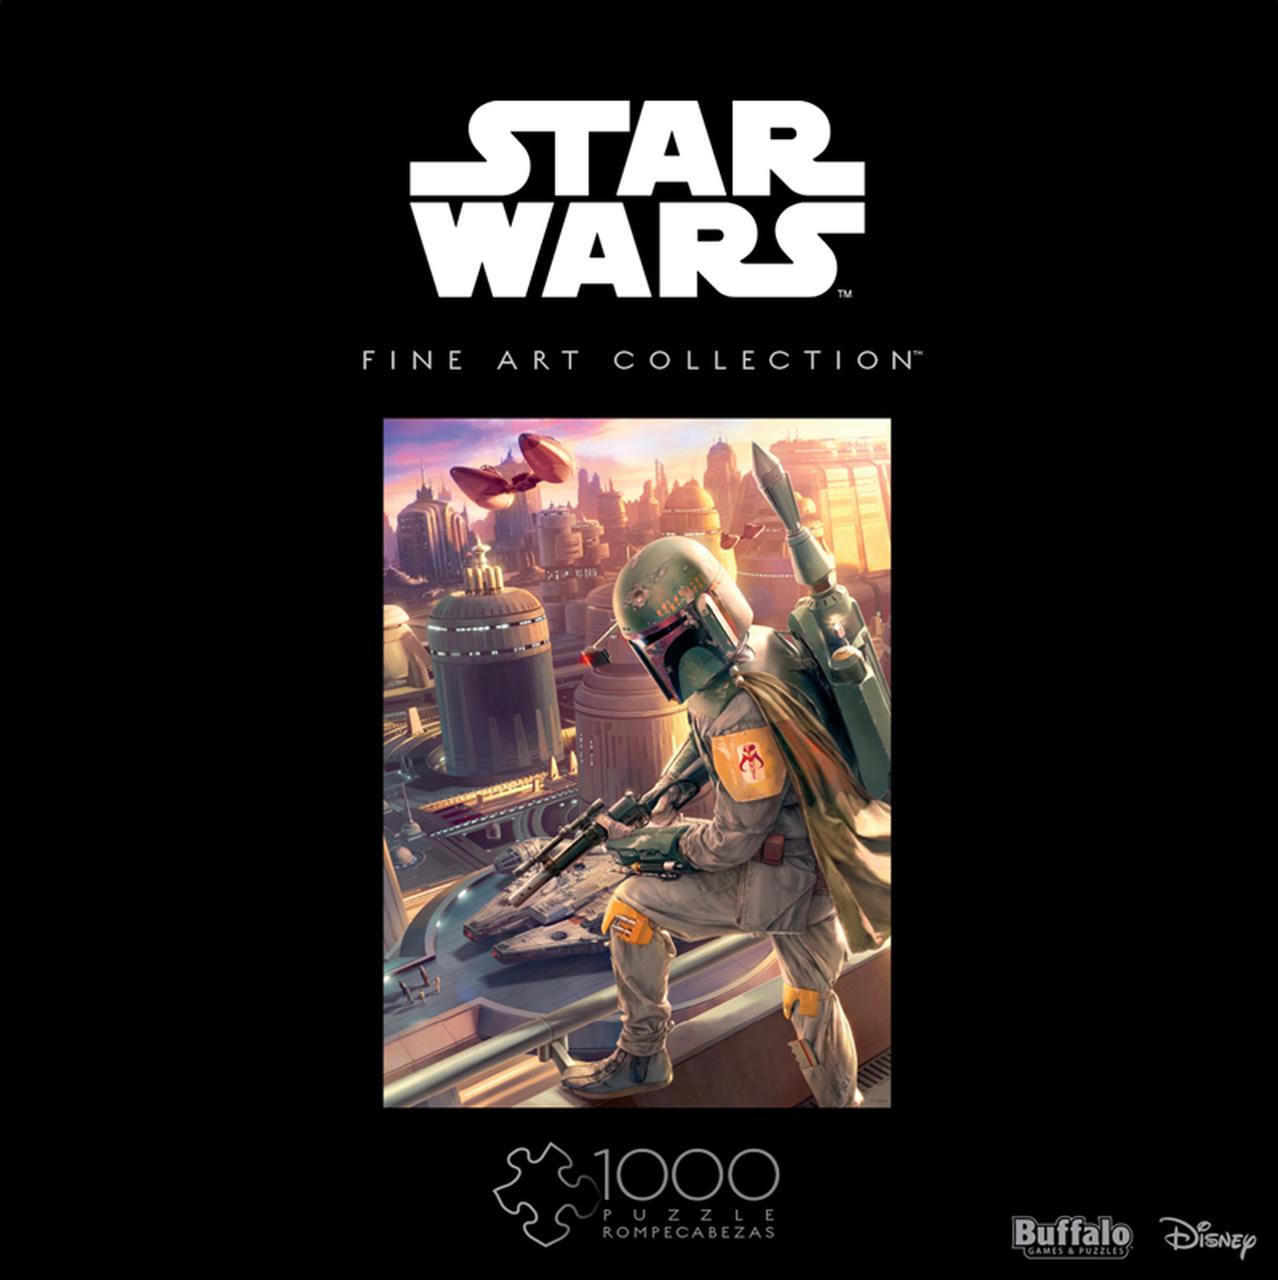 Star Wars Fine Art Collection Boba Fett | Puzzle Buffalo 1000 Piezas